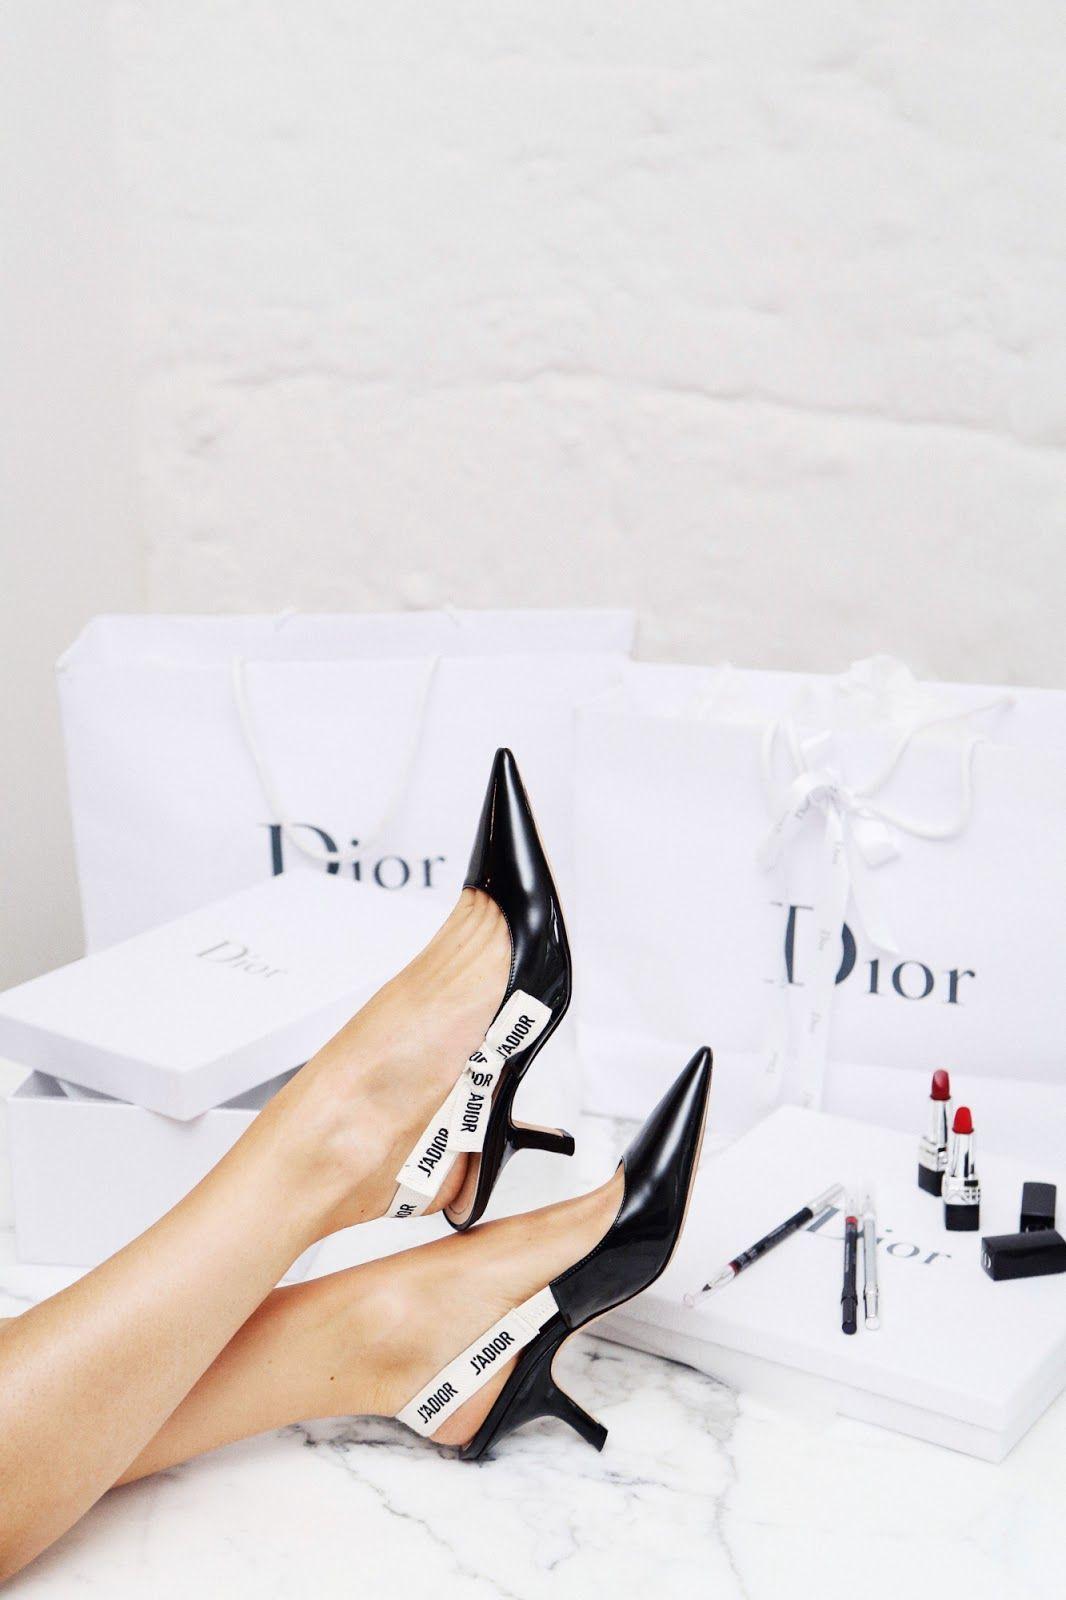 Dior, JAdior Kitten Heel Pump